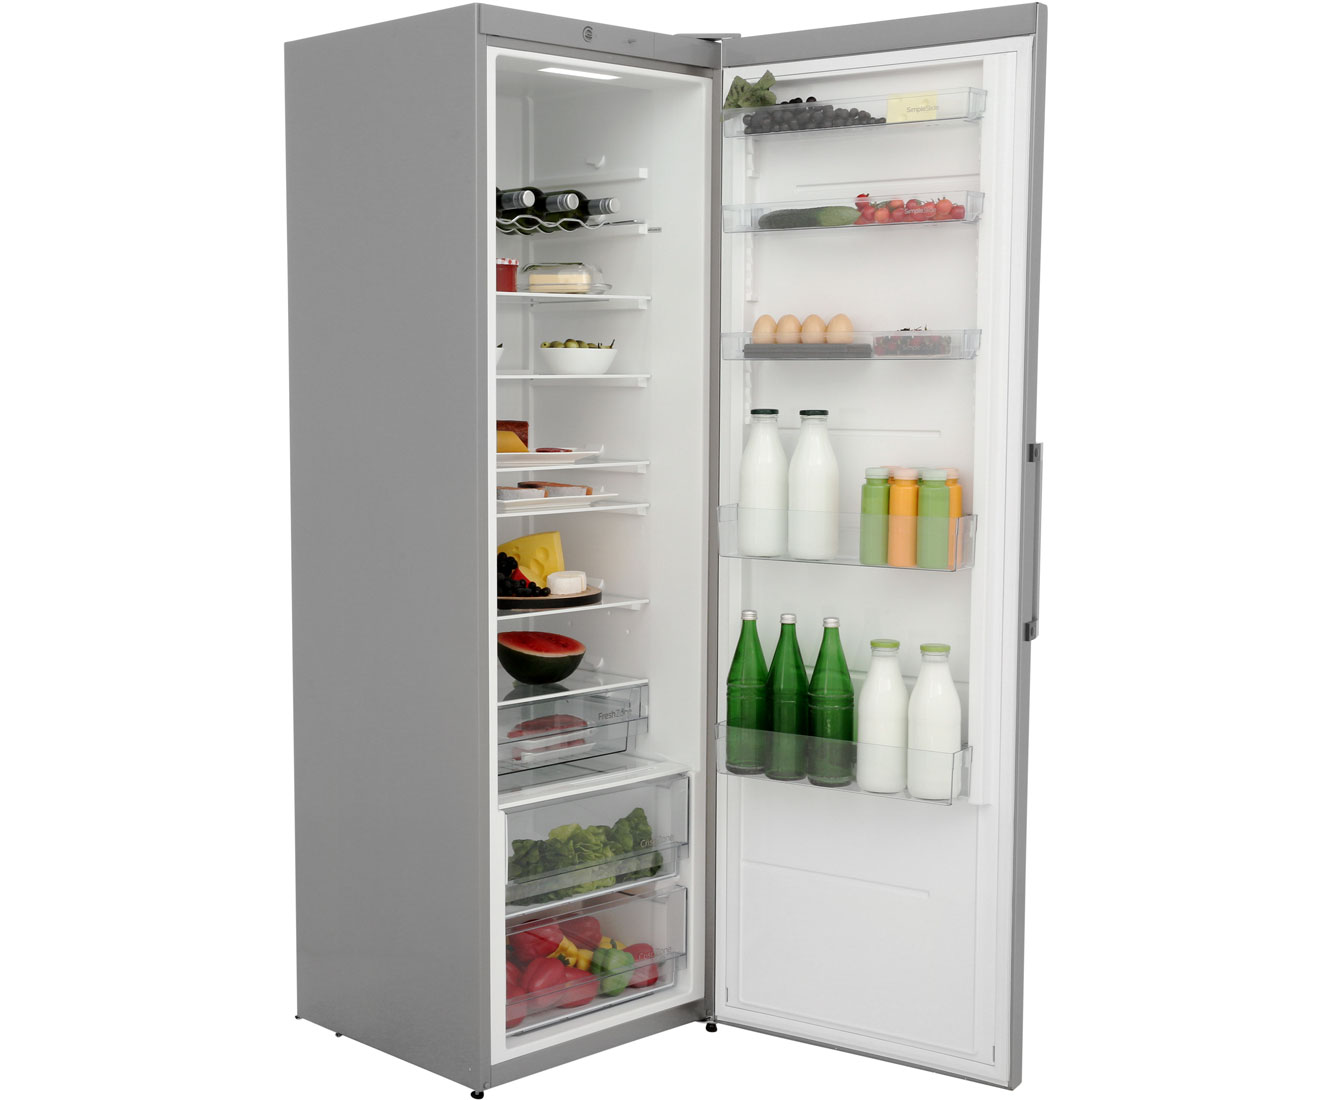 Gorenje Kühlschrank Freistehend : Freistehender kühlschrank edelstahl bosch kgv39vl33 serie 4 kühl